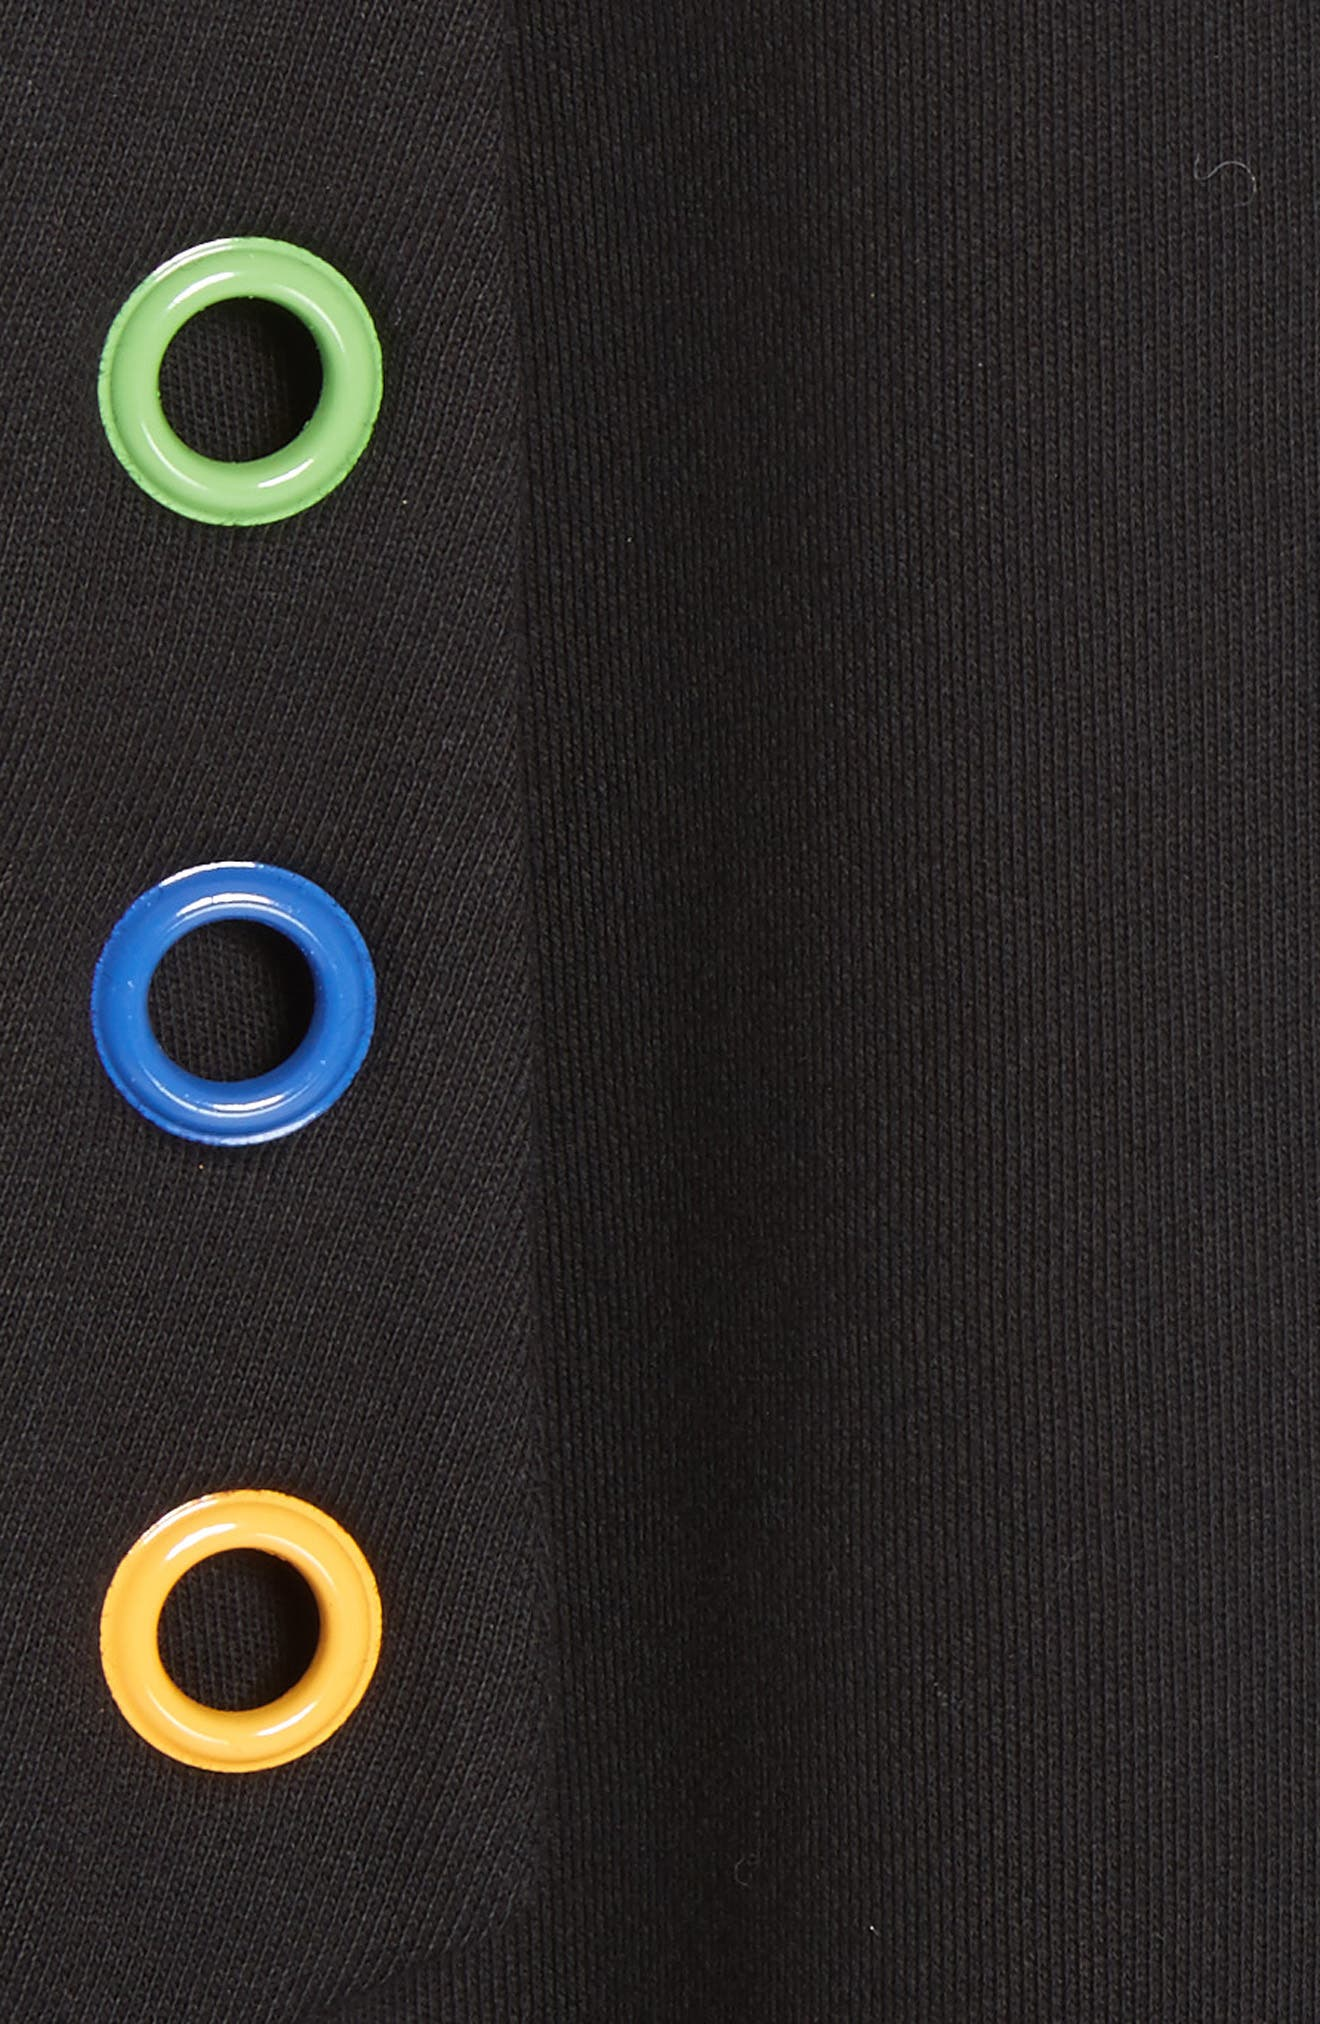 Christian Riese Lassen Sweatshirt Dress,                             Alternate thumbnail 5, color,                             Black